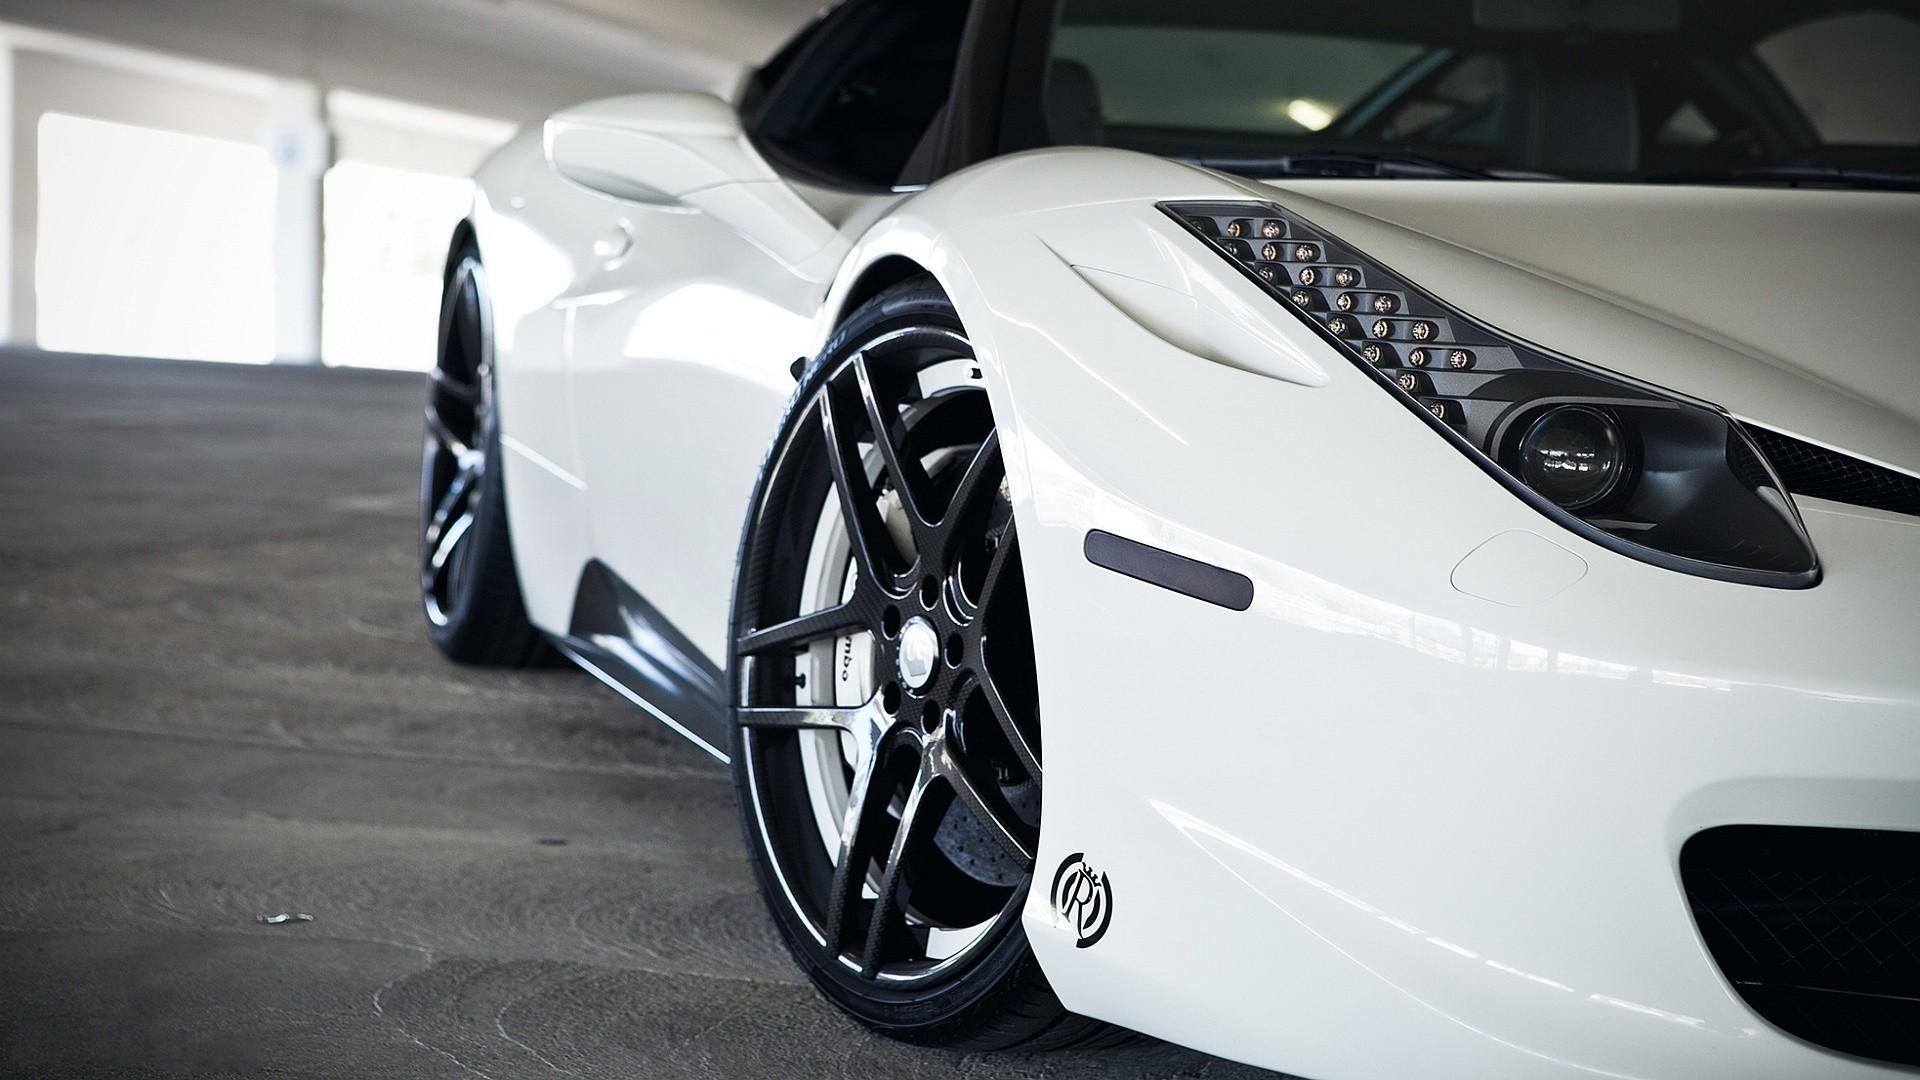 Ferrari 458 Italia Wallpaper Hd Car Ferrari 458 Italia White Cars Wallpapers Hd